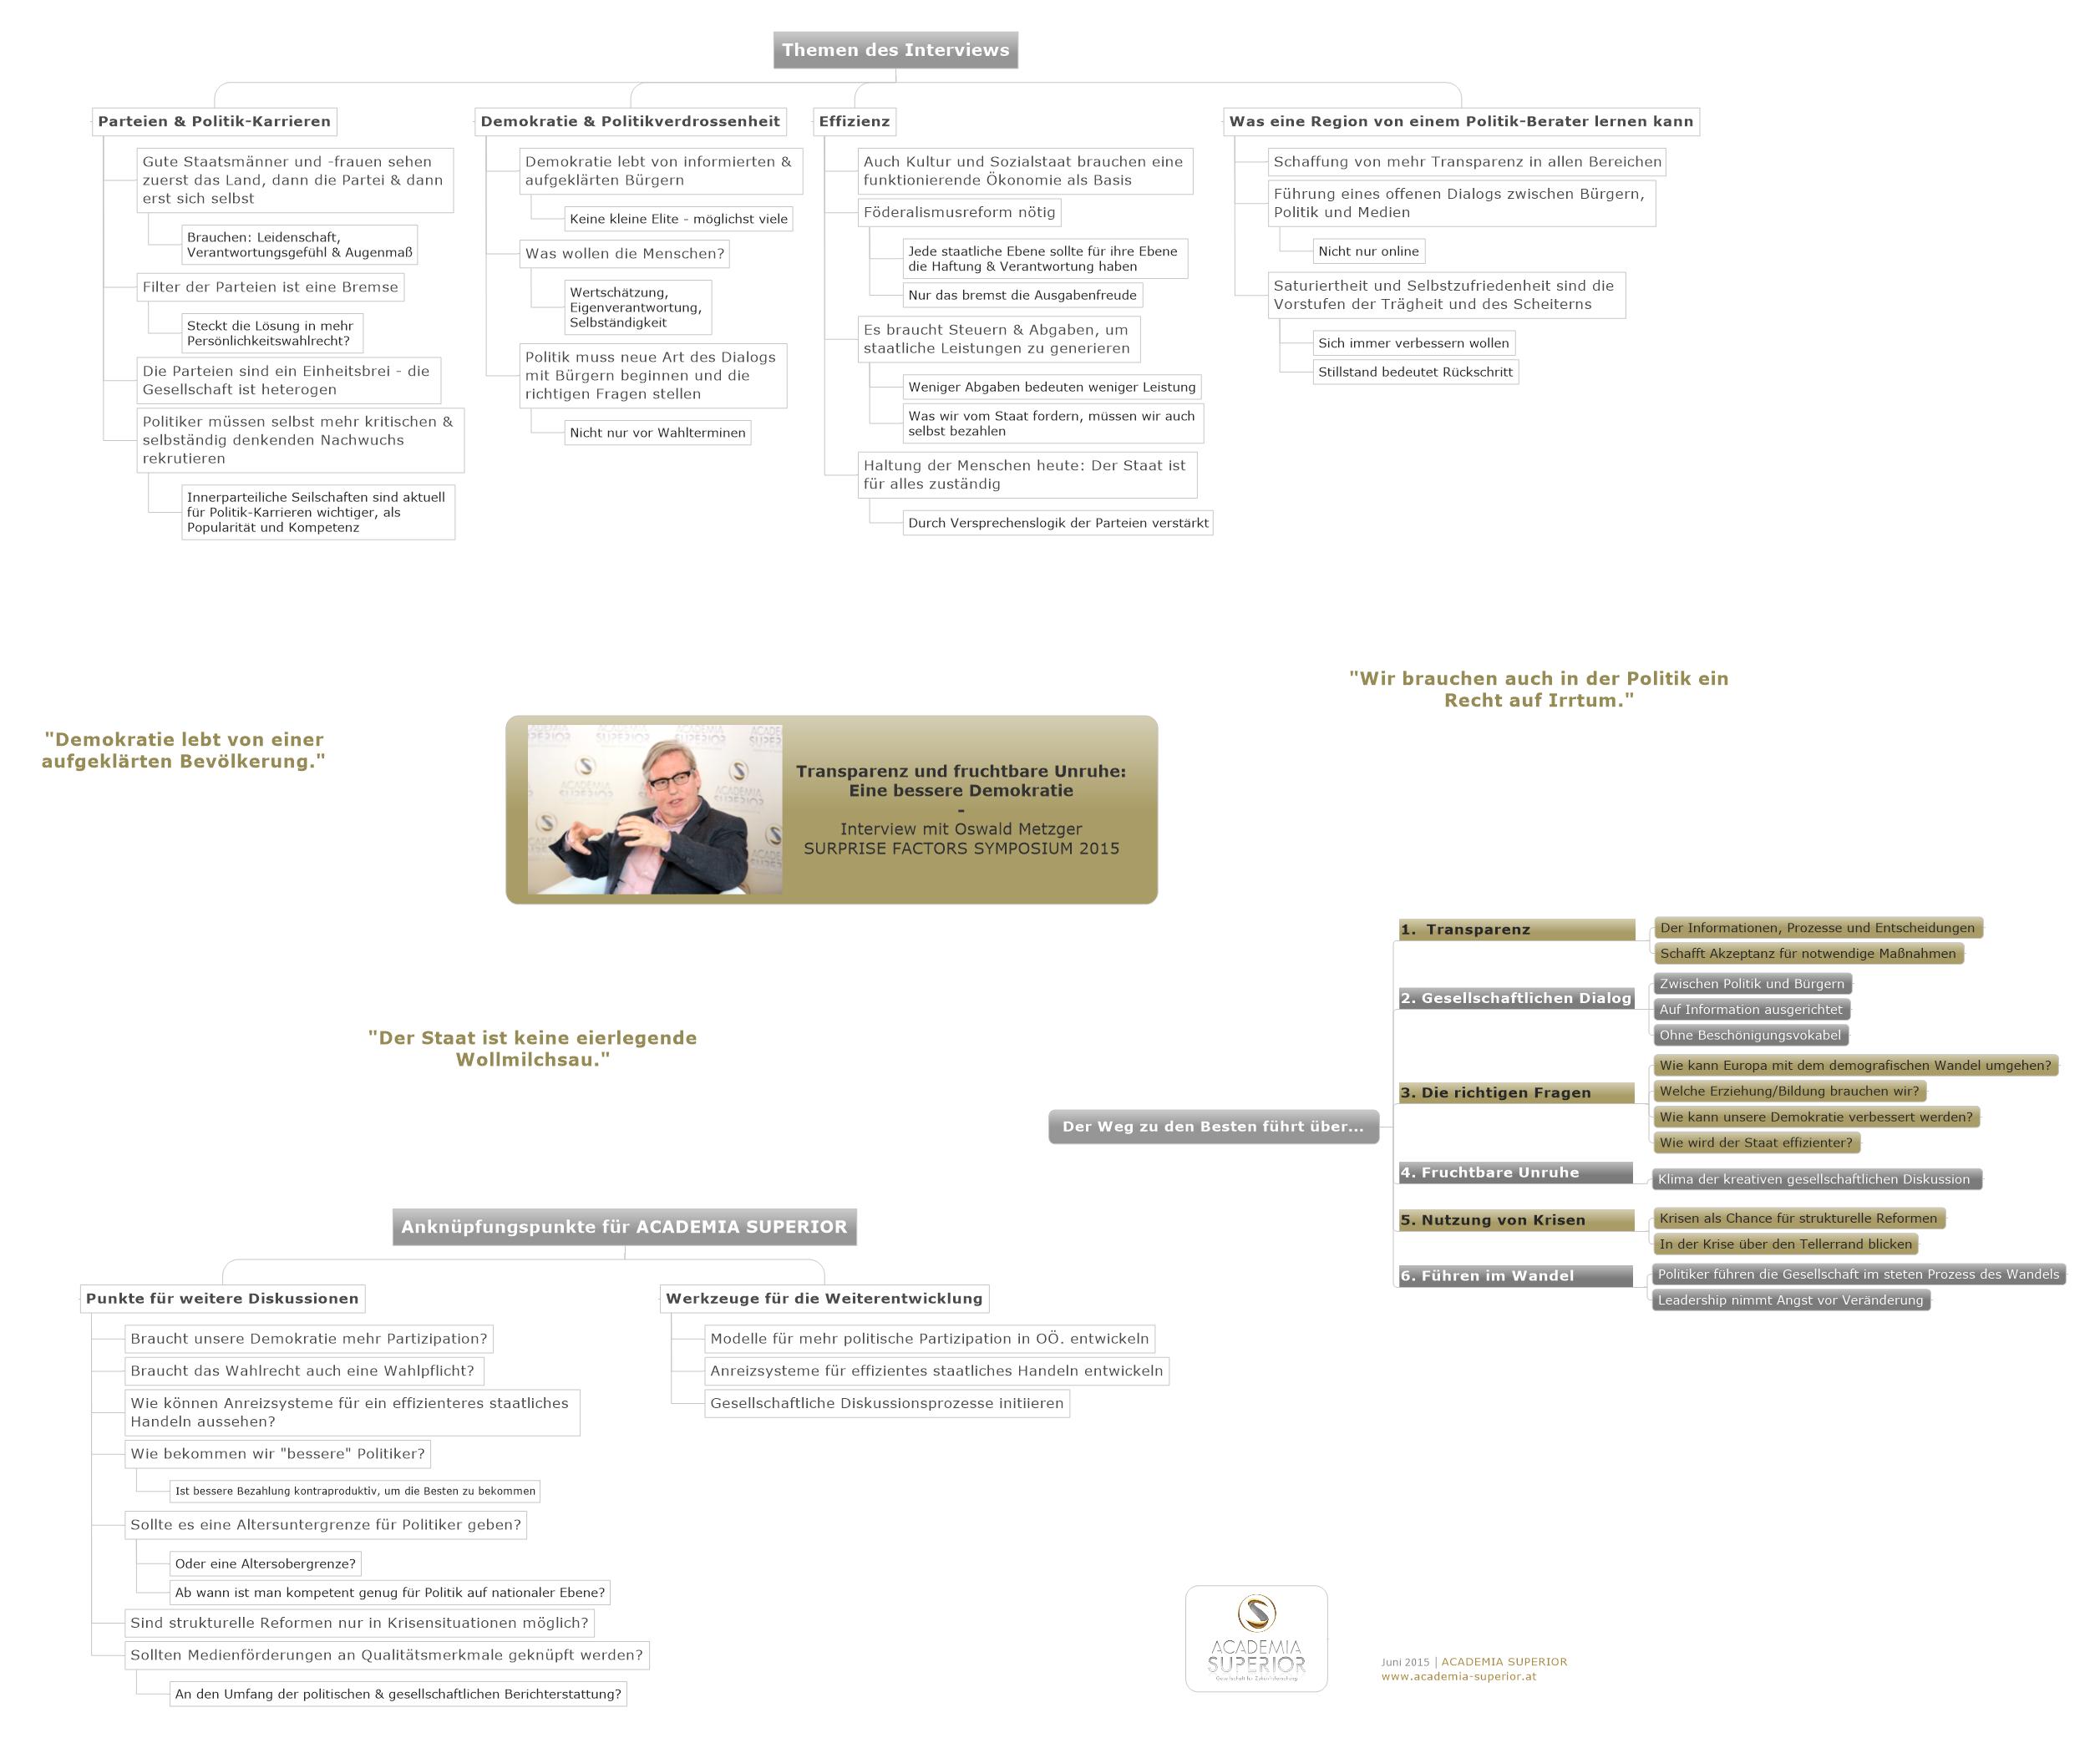 MindMap: Interview mit Oswald Metzger (dt)